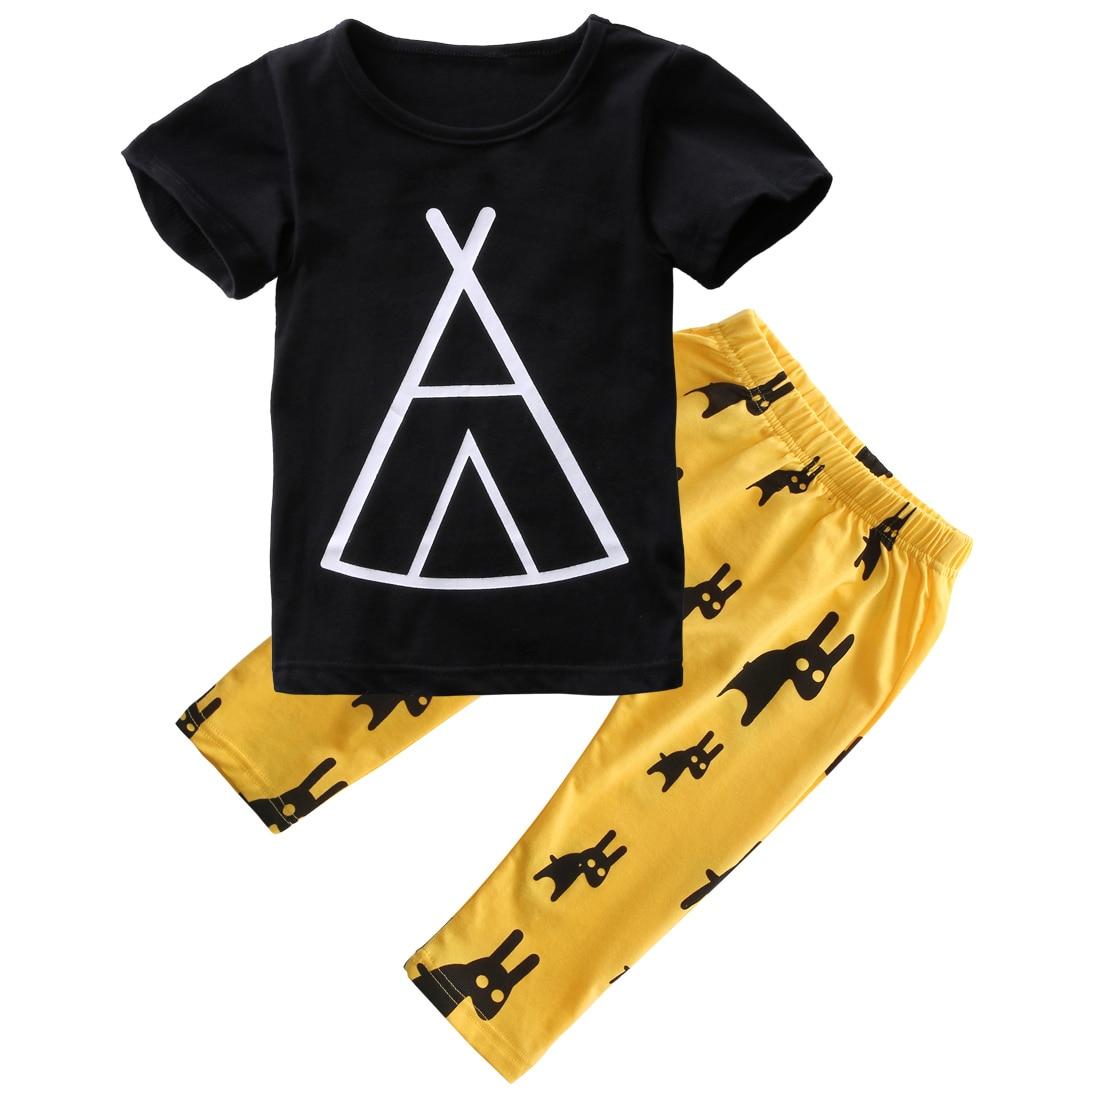 2pcs Newborn Baby Boy Clothes Set Fashion Casual T-shirt Tops+Long Print Pants 2017 Hot Cute Outfits Set